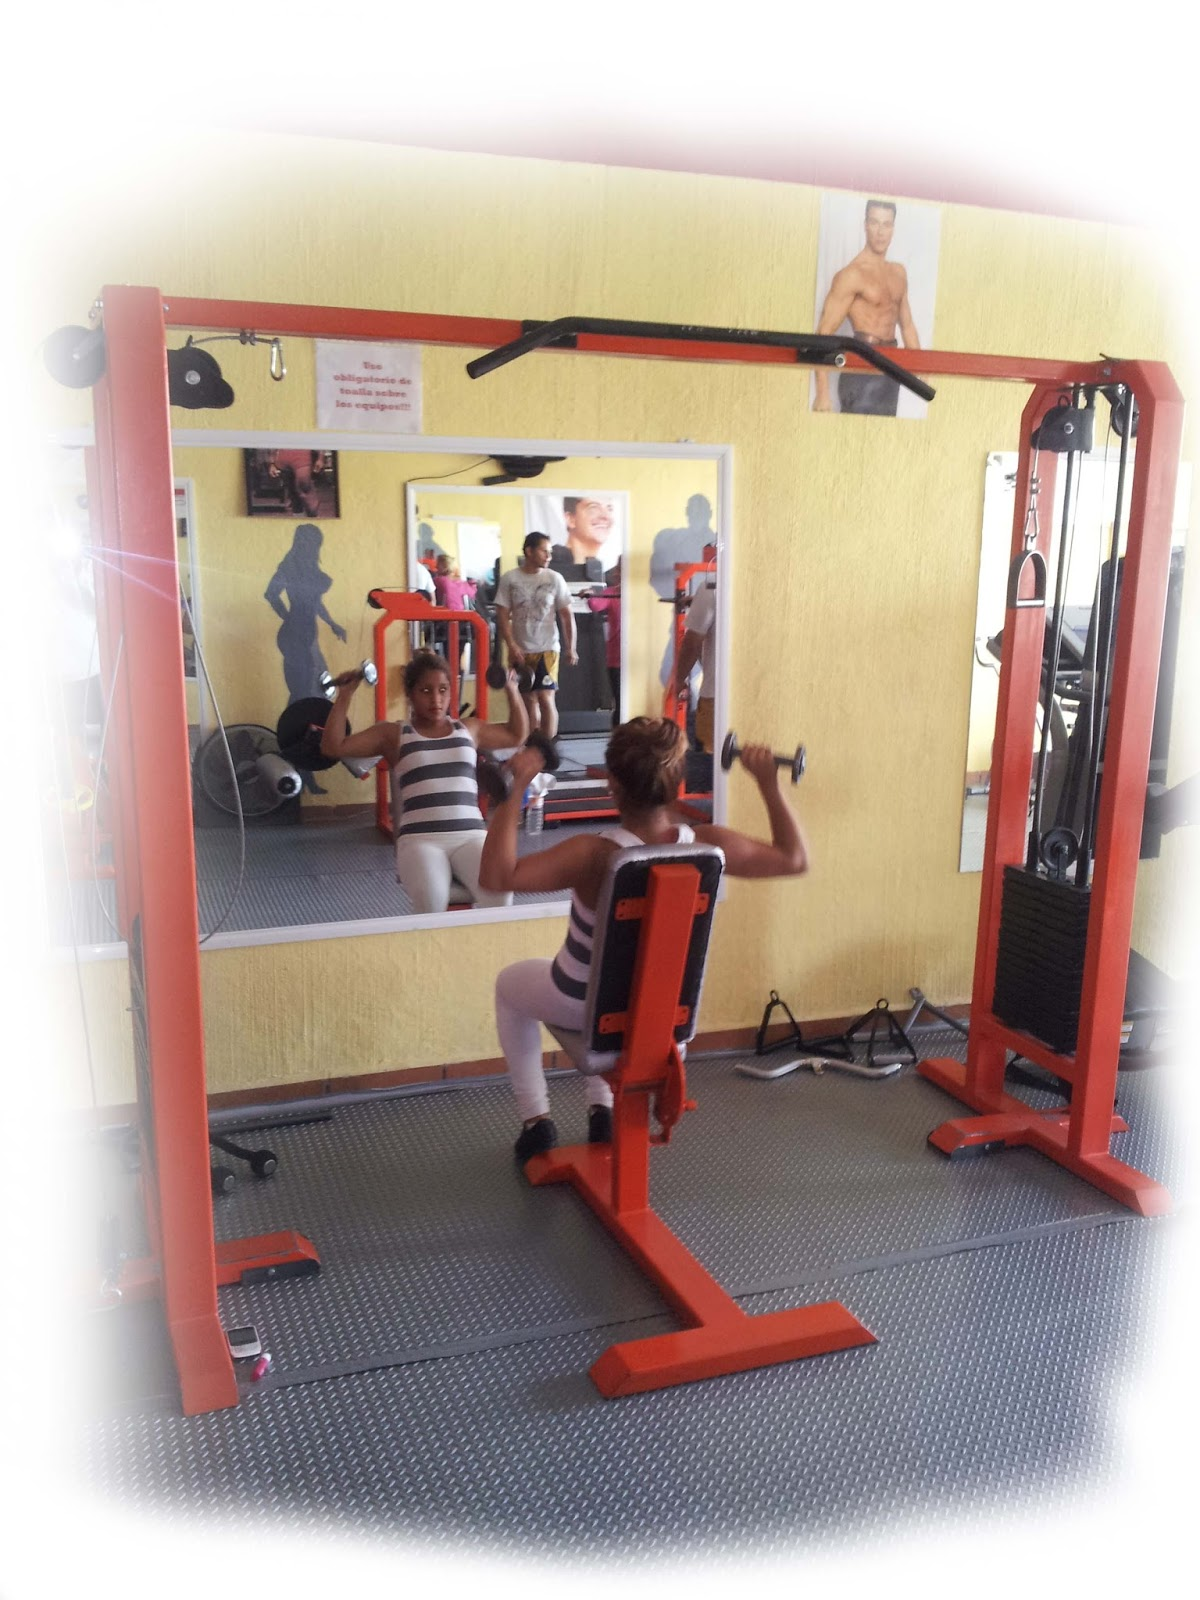 New body power system equipos de gimnasio equipos - Equipamiento de gimnasios ...